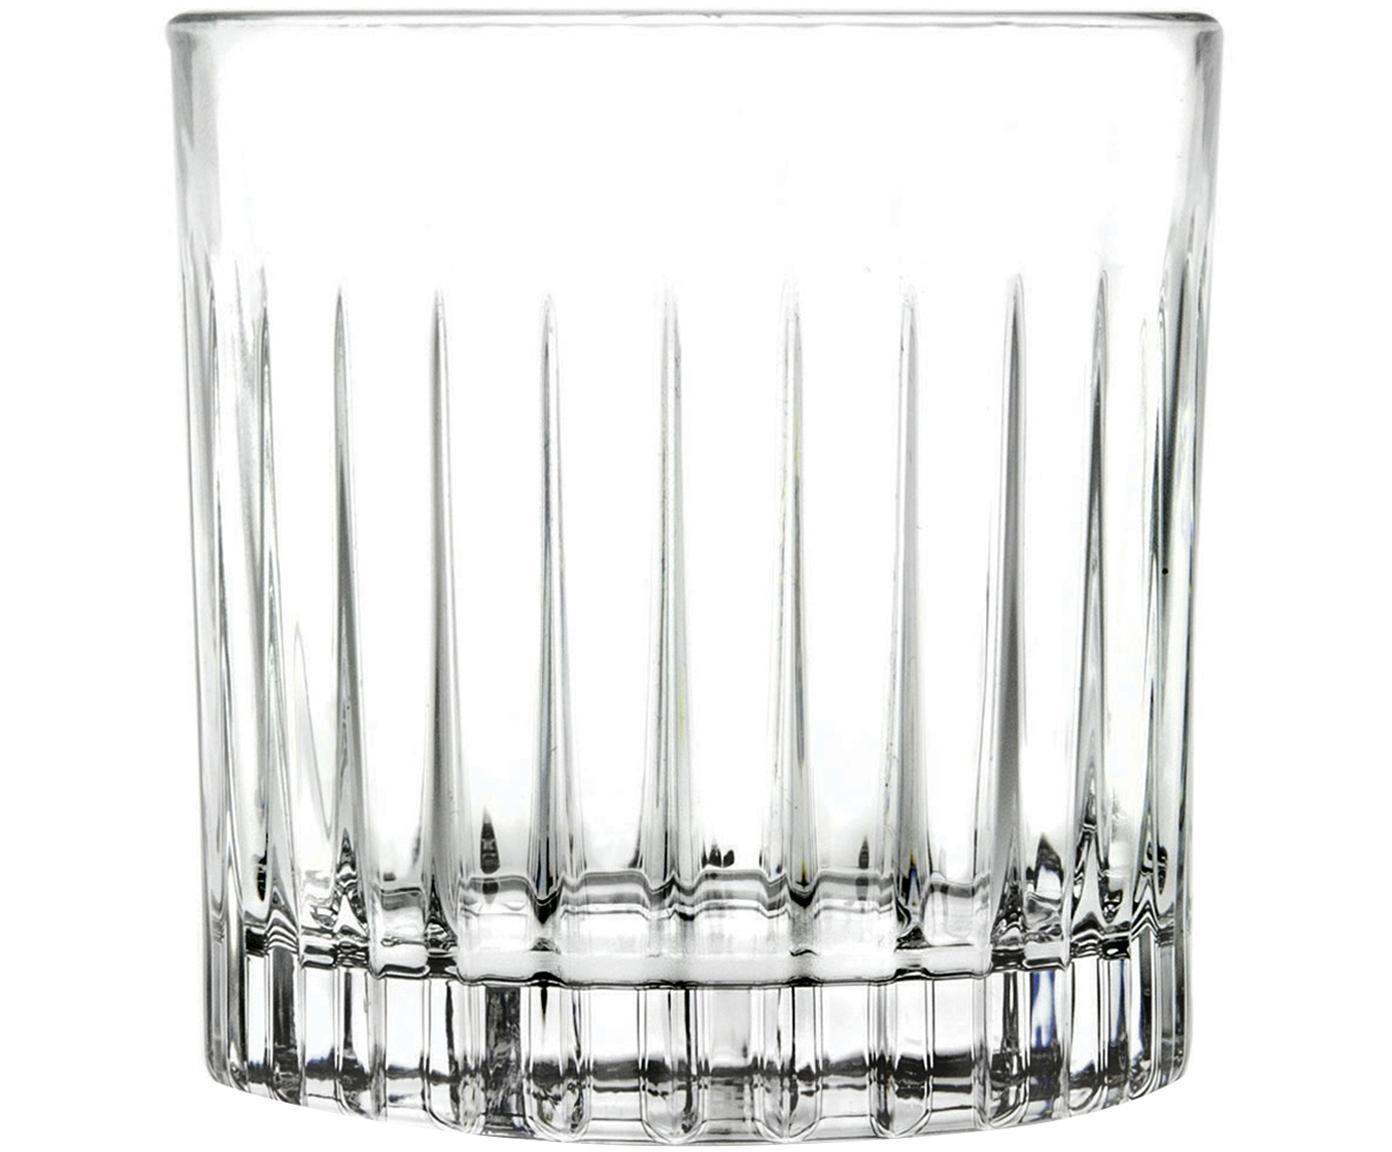 Kristallen whiskyglazen Timeless, 6 stuks, Kristalglas, Transparant, Ø 9 x H 9 cm